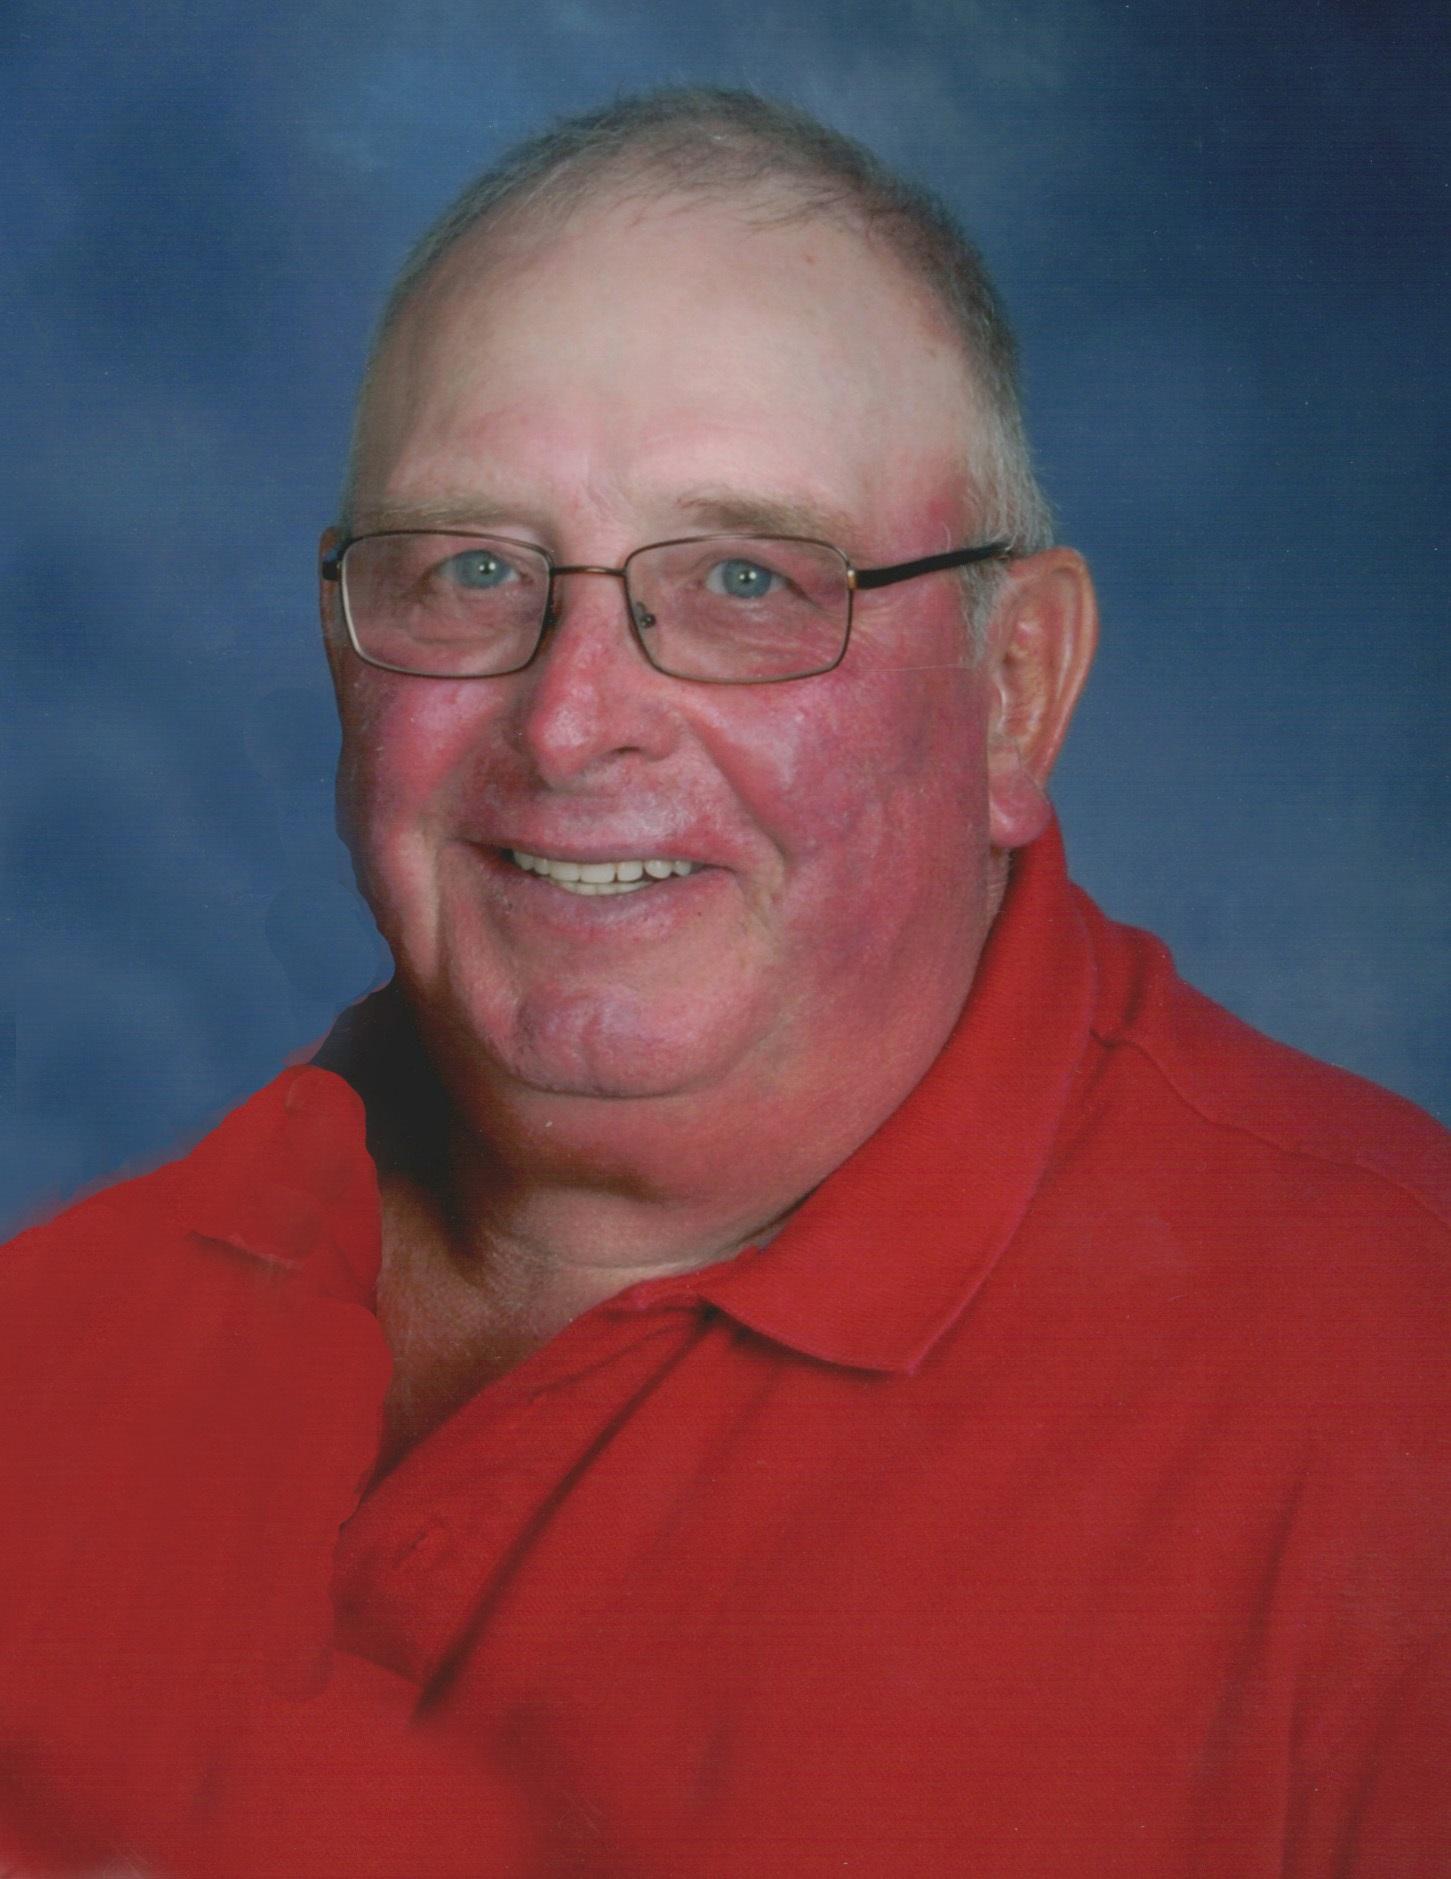 Dale Becker, age 68, of Snyder, Nebraska